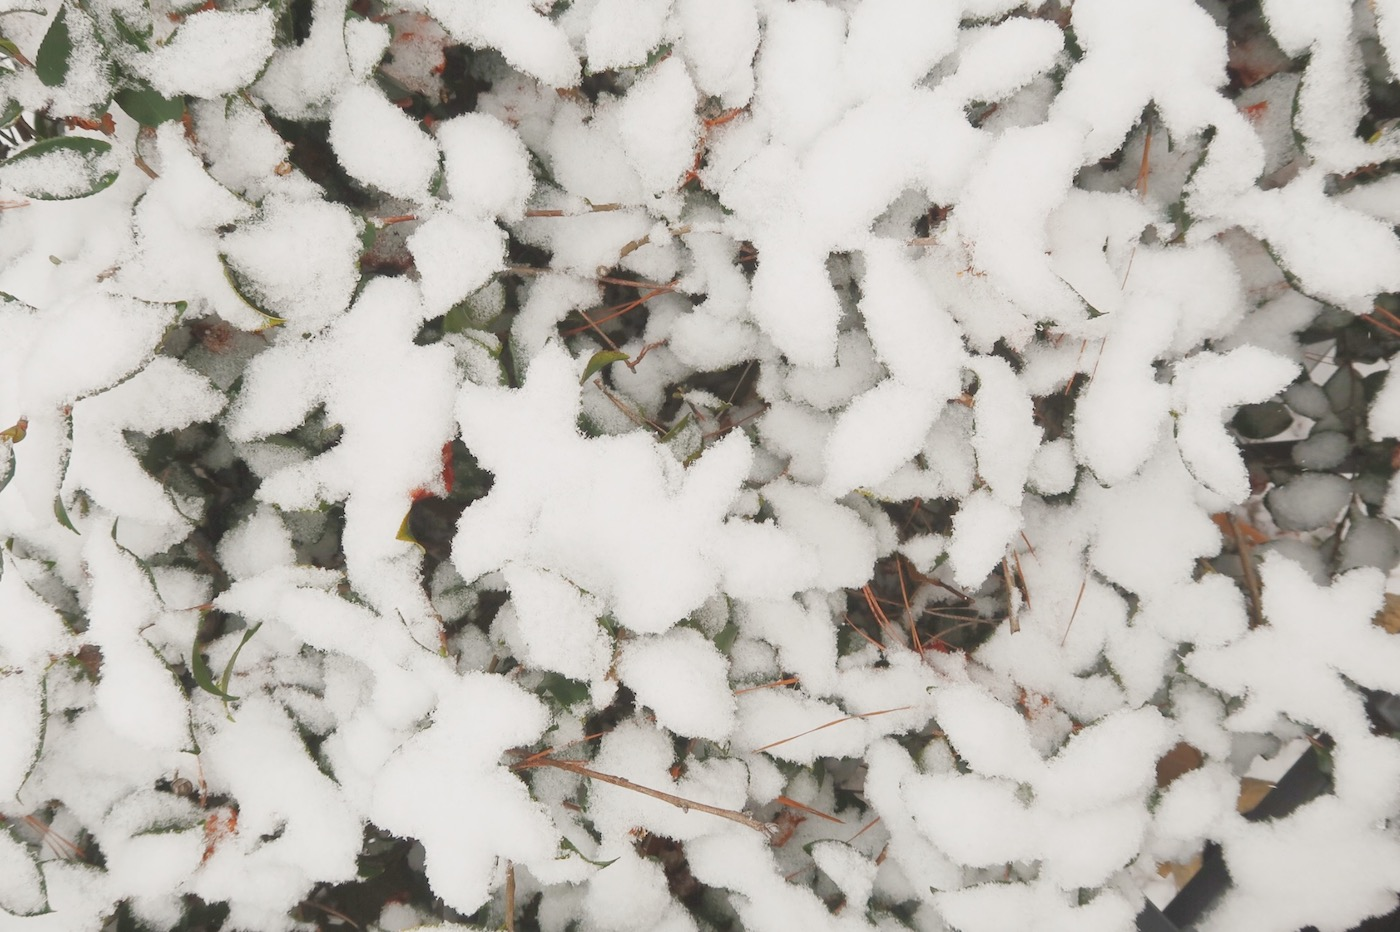 Snow // www.thehiveblog.com